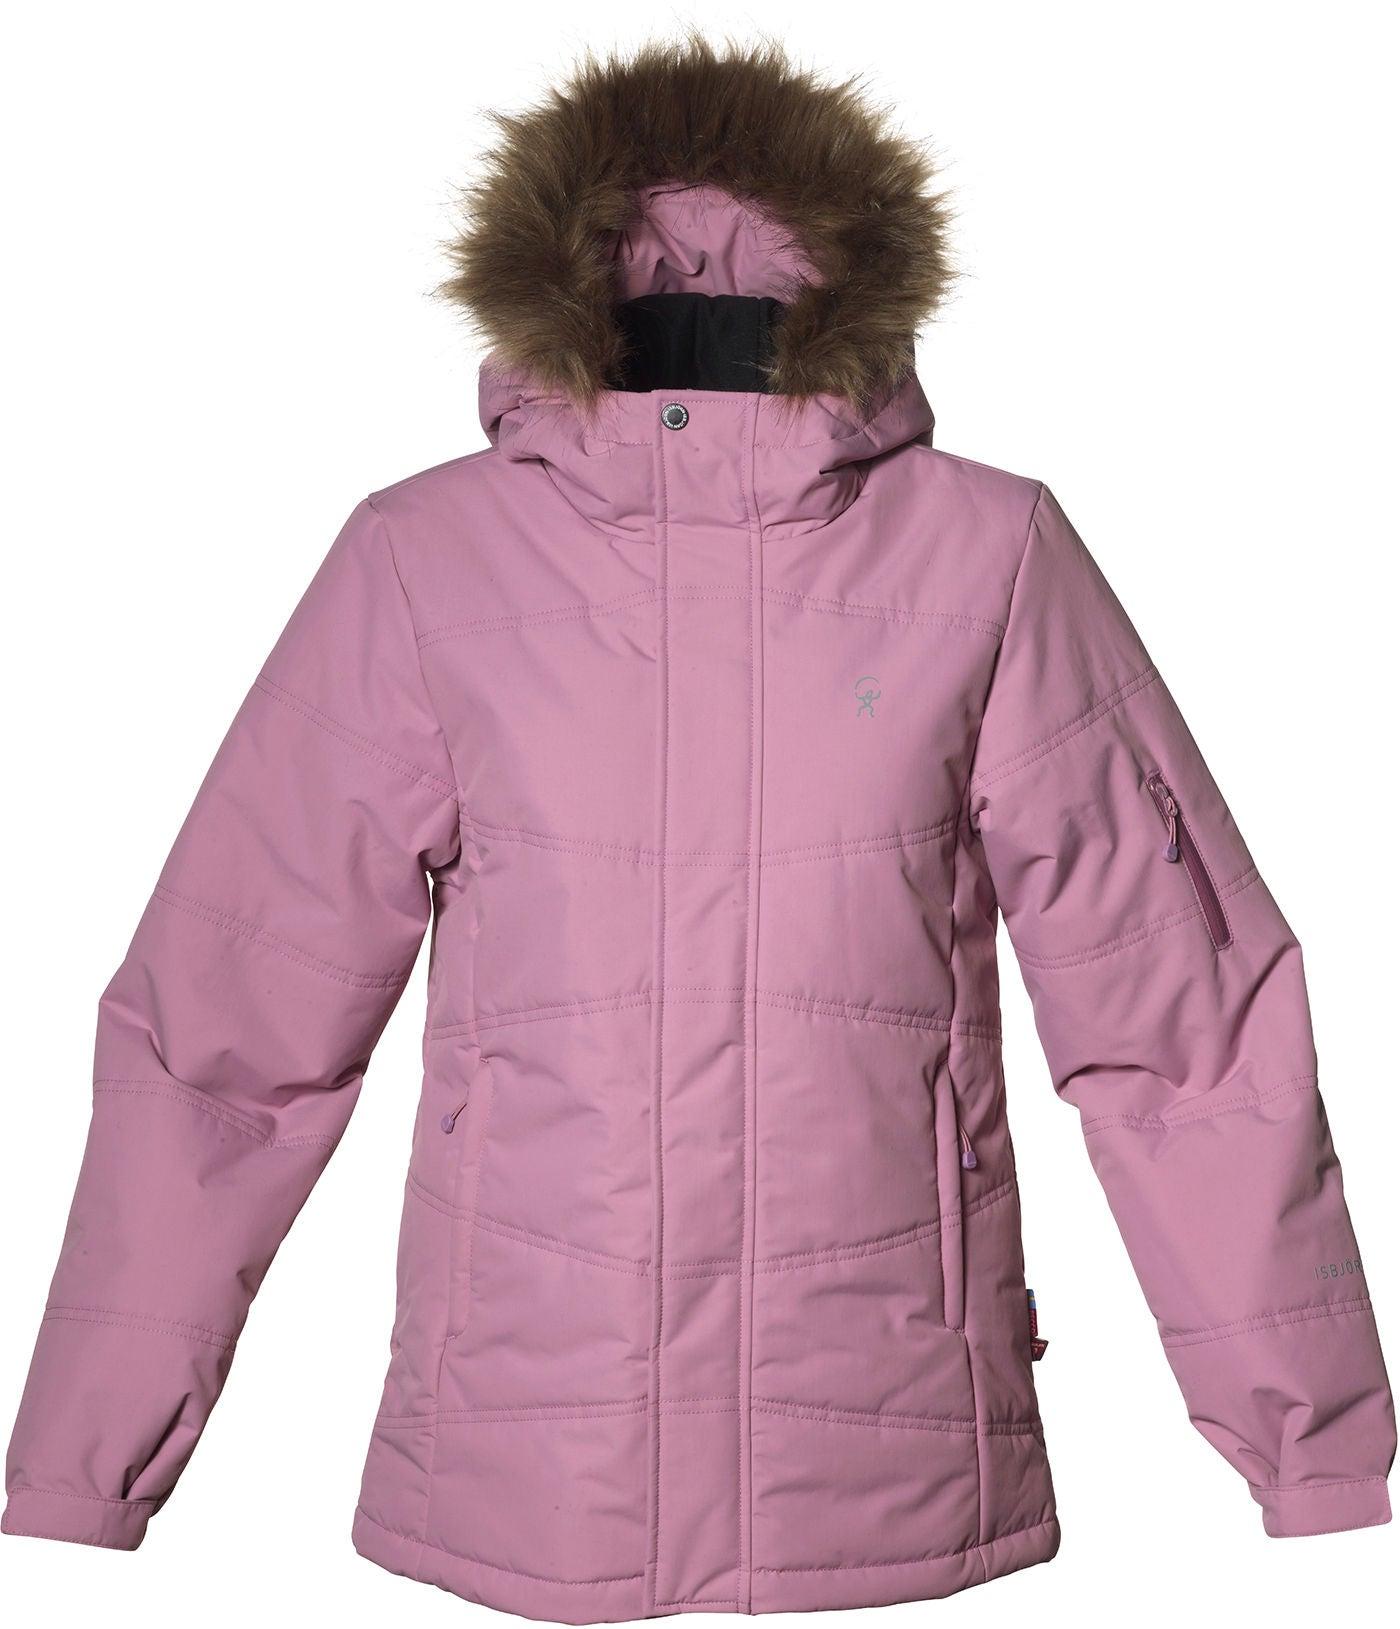 Isbjörn Downhill Vinterjacka, Dusty Pink 146-152